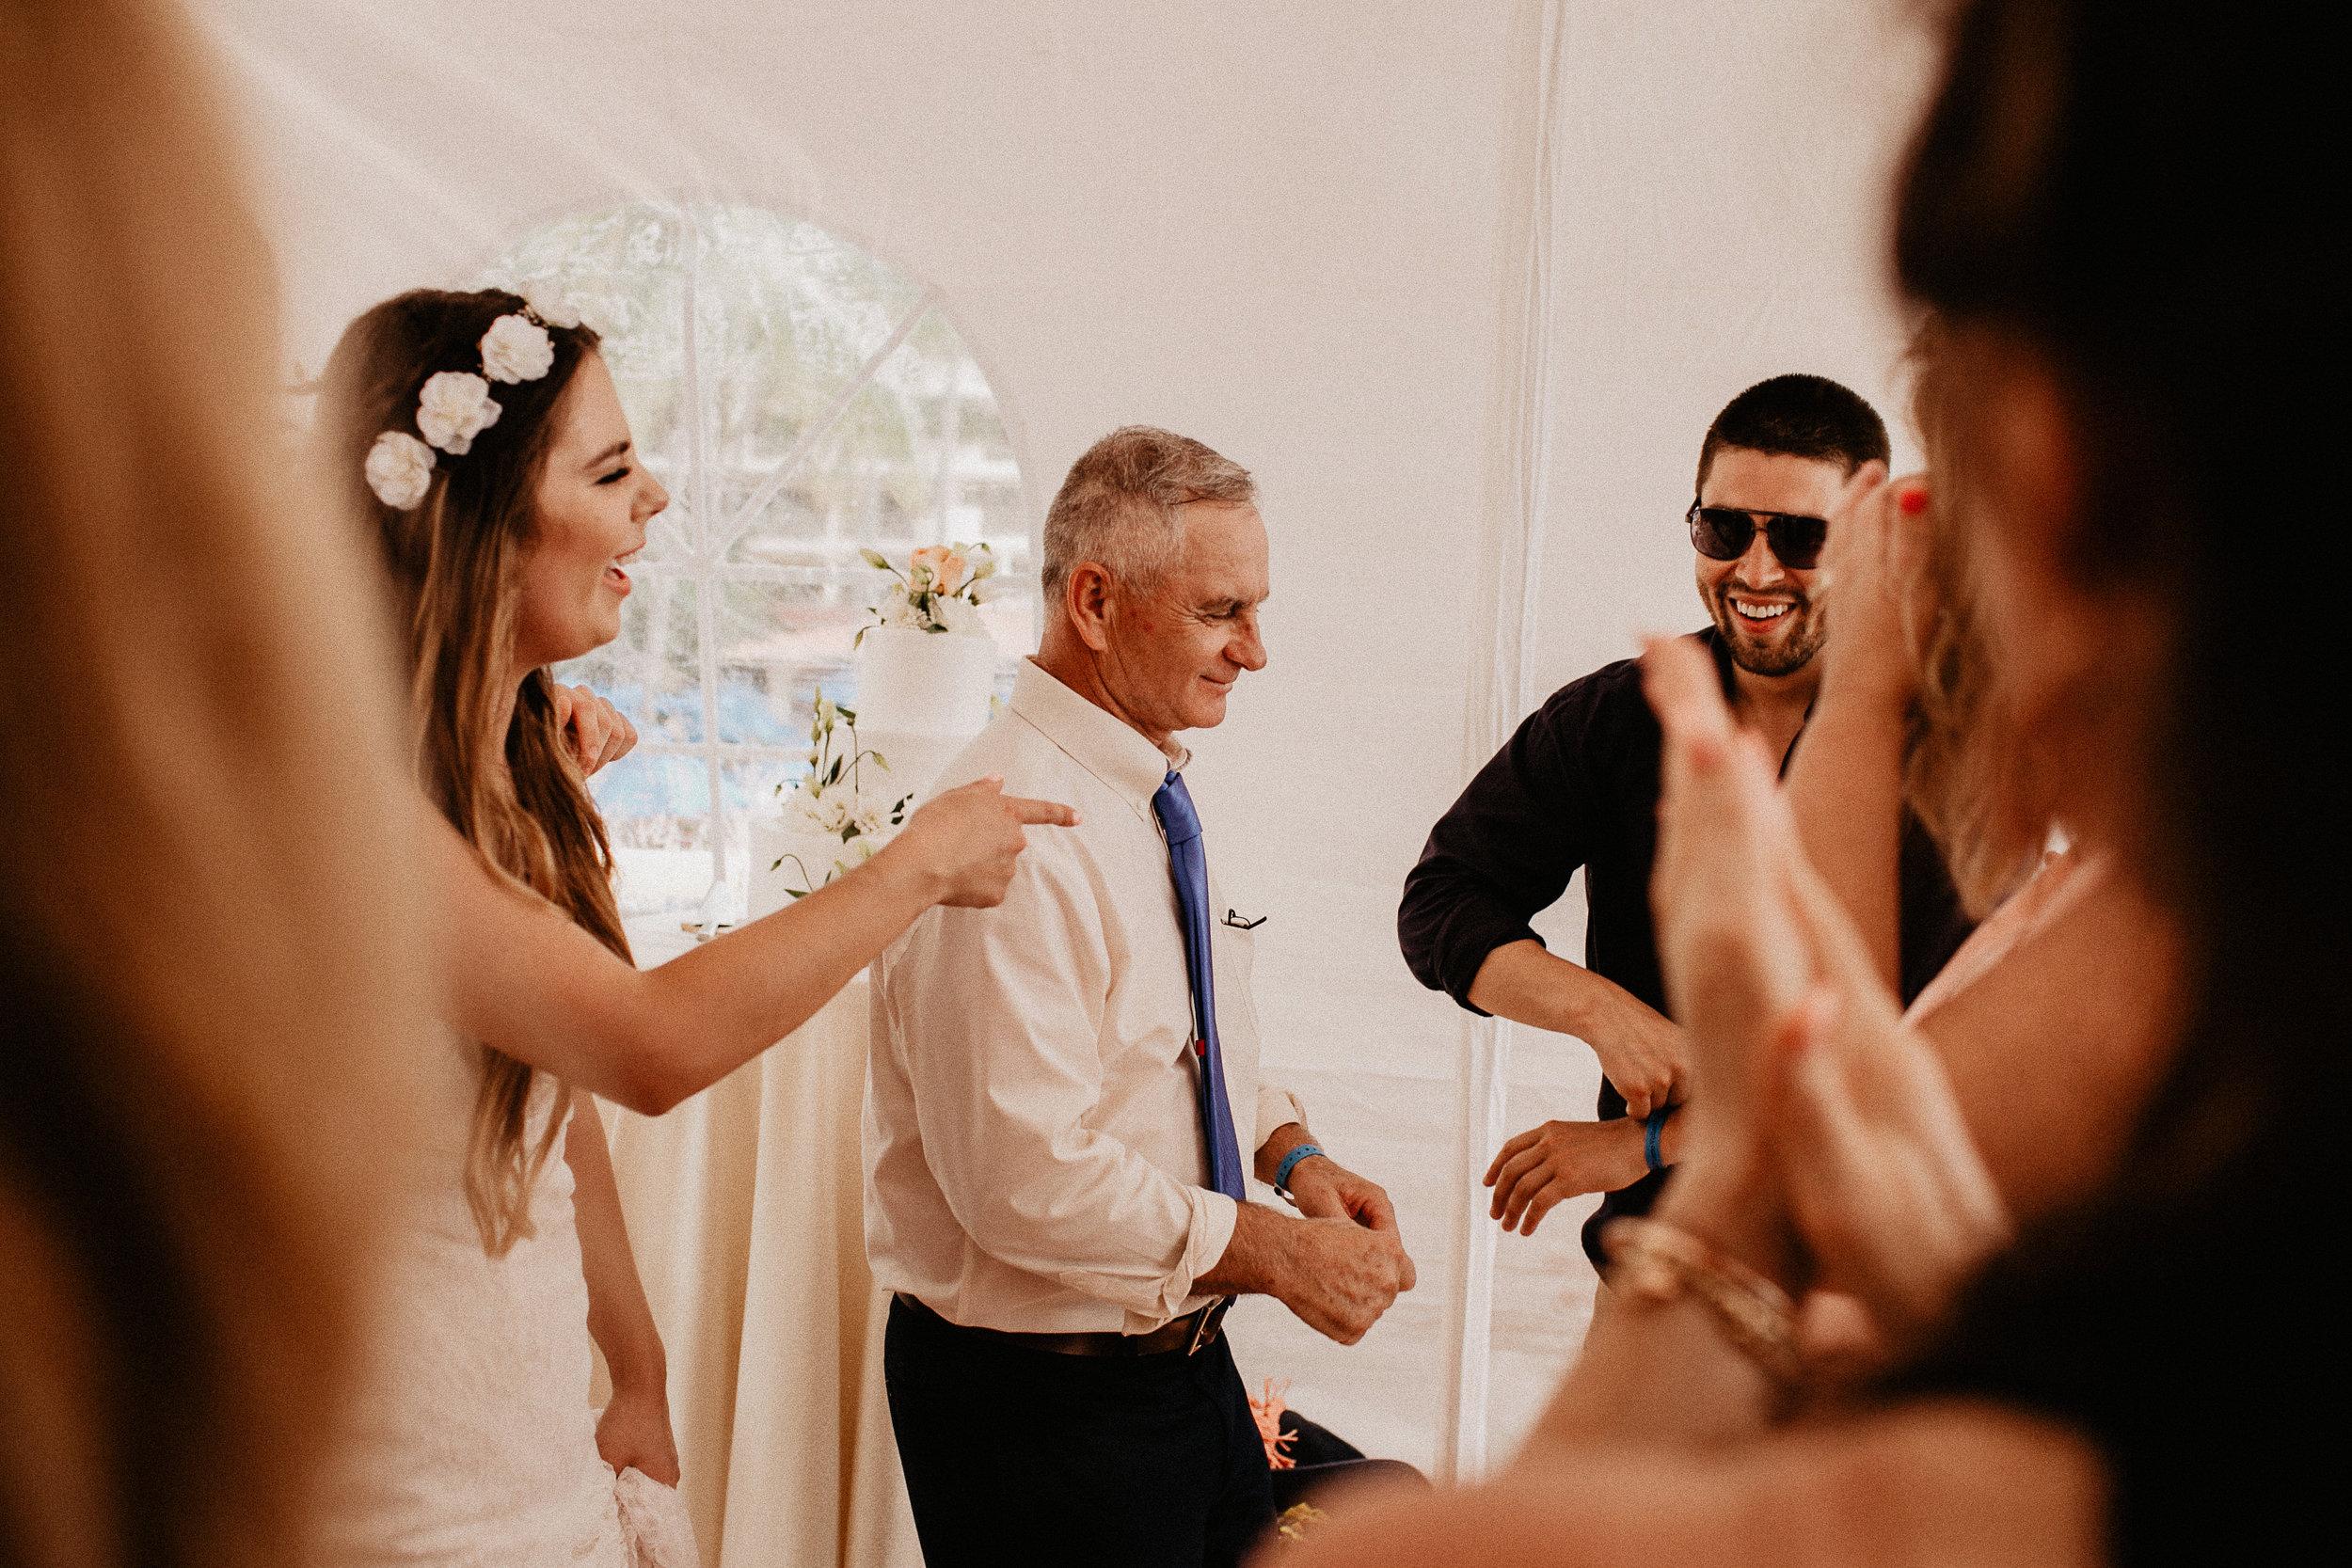 alfonso_flores_destination_wedding_photography_puerto_vallarta_hotel_barcelo_vallarta_cuttler_amela-509.JPG